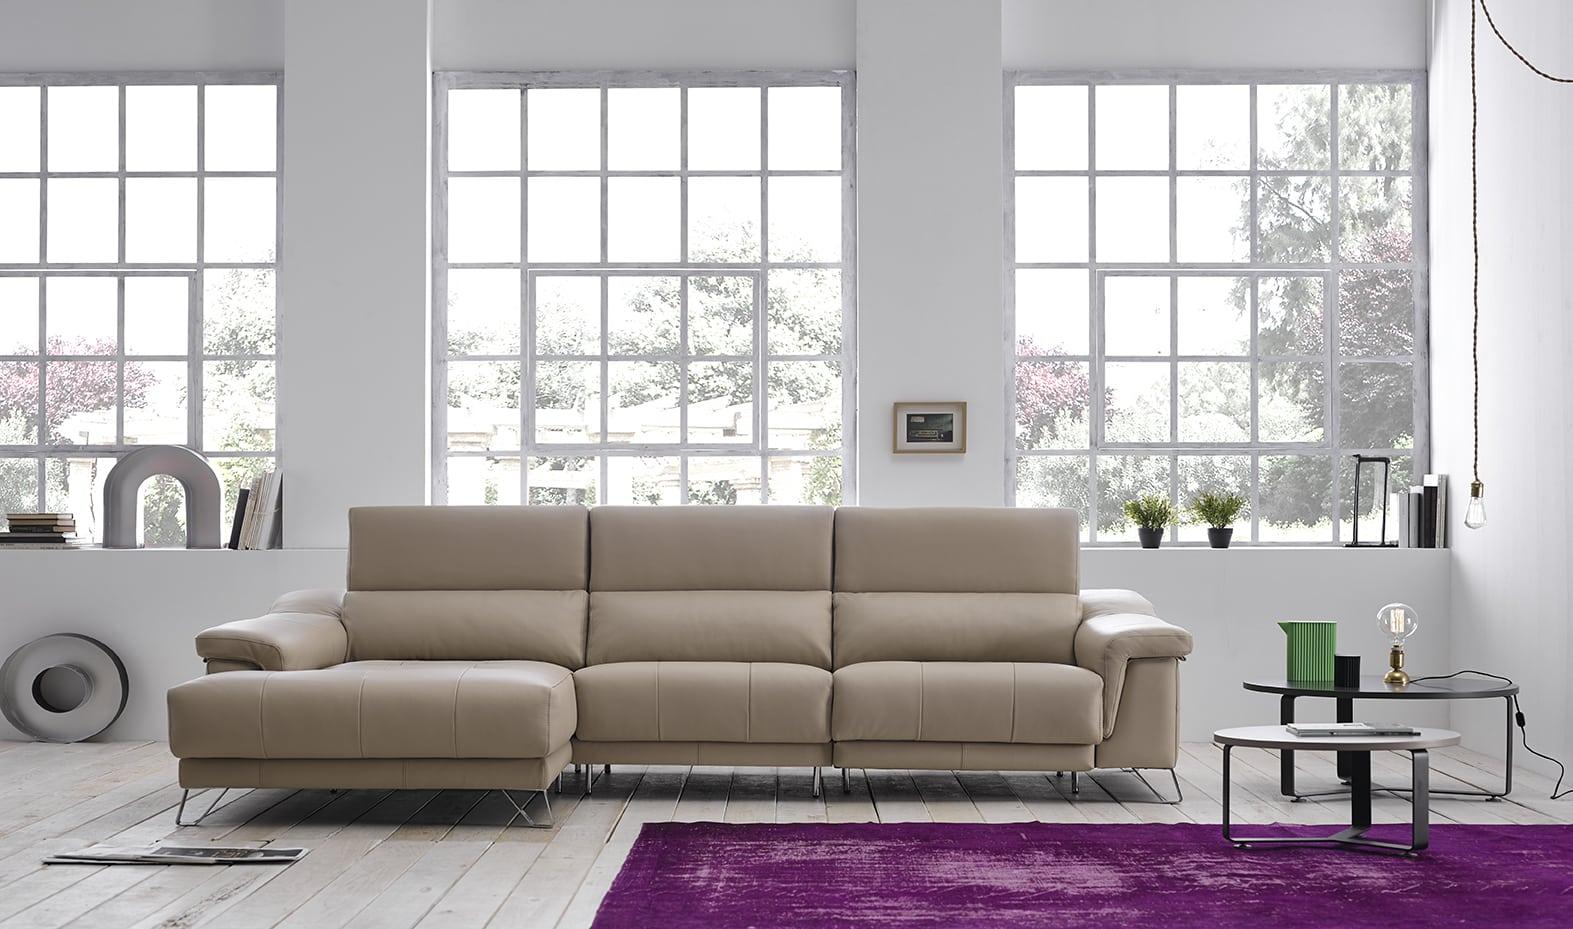 sofas-modernos-General-muebles-paco-caballero-1801-5cb470aee5ce3